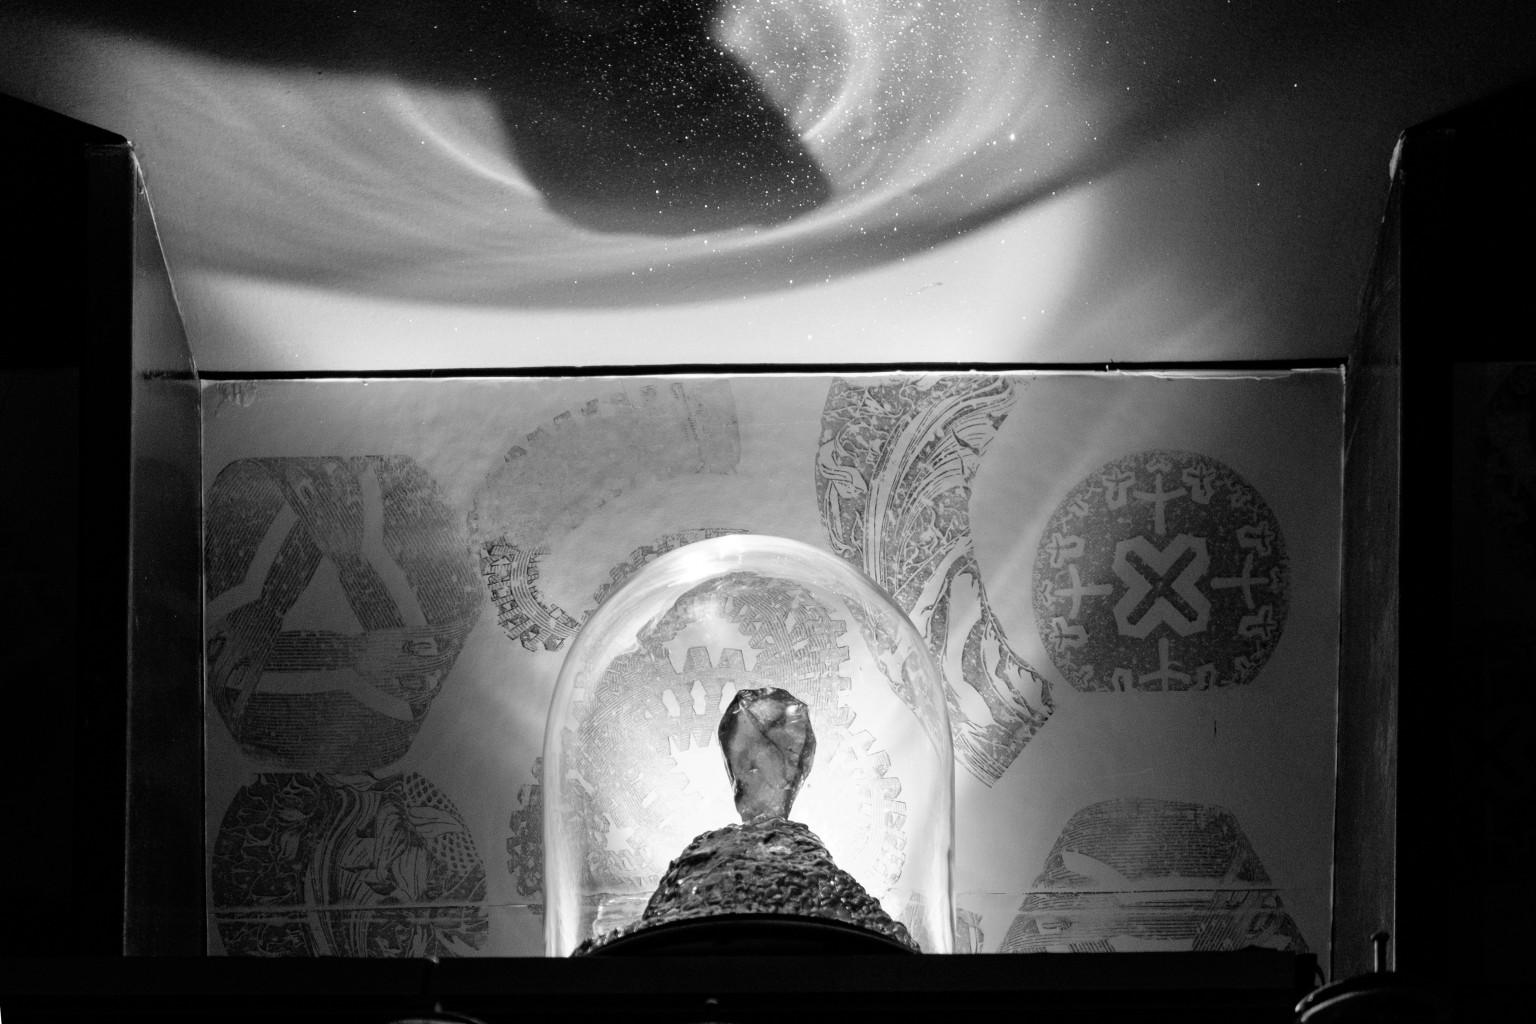 Promulgation der Karte des Elften September, Stefan Glettler, Frank Ruf. Fotos: Thomas Ries